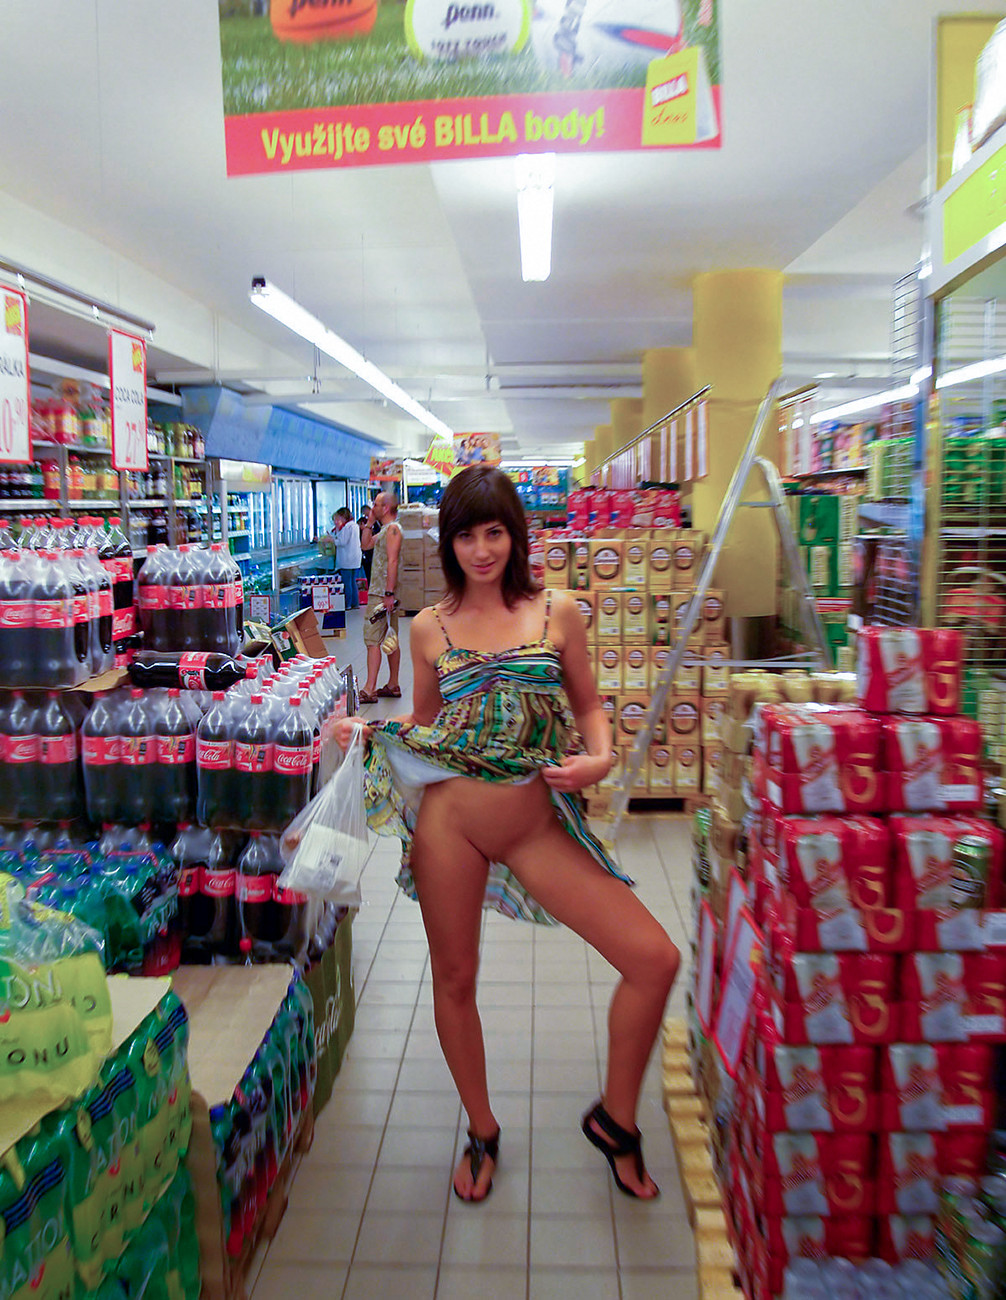 bottomless-girls-nude-mix-28